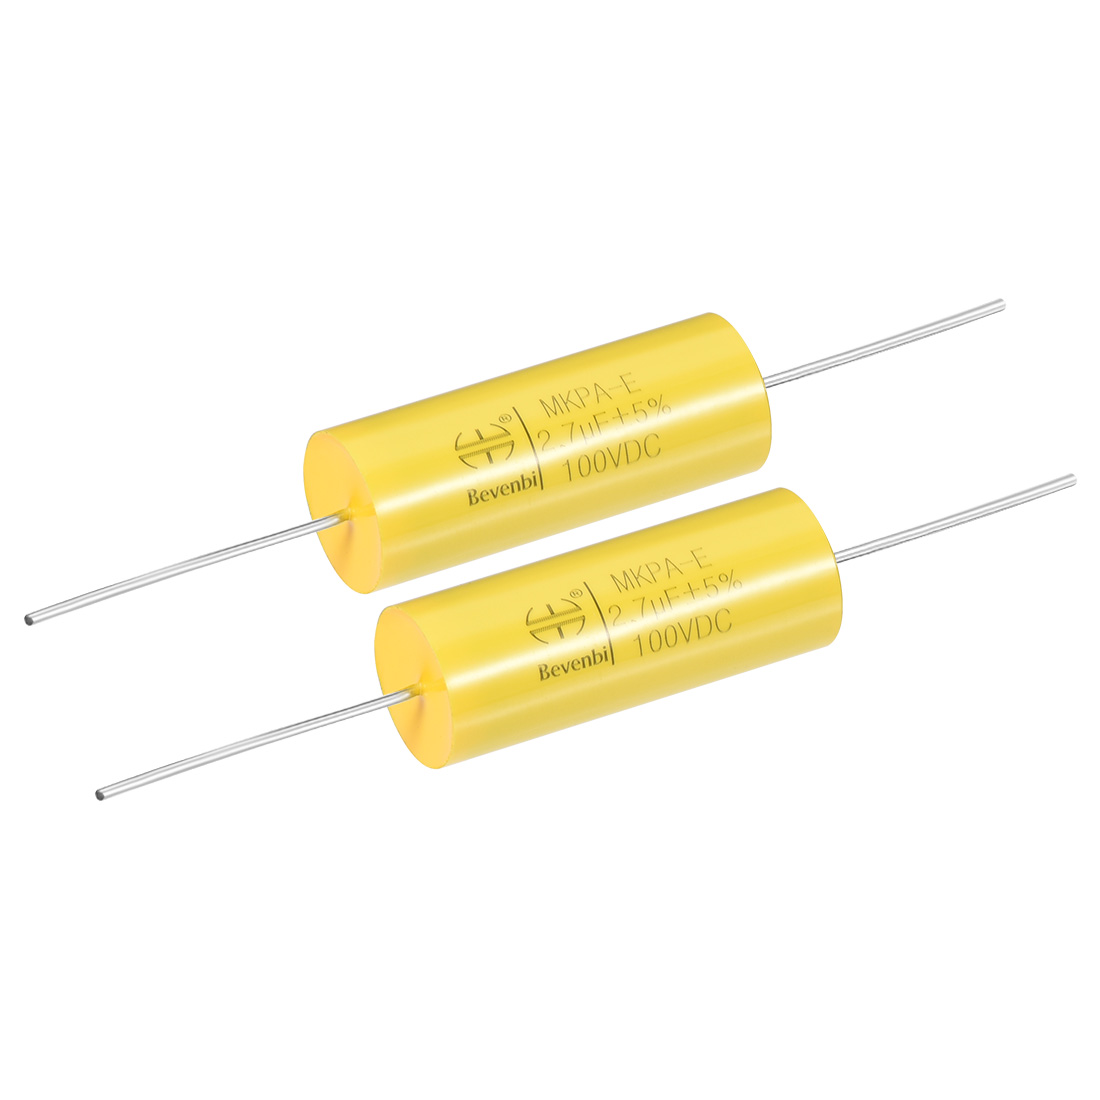 Film Capacitor 100V DC 2.7uF MKPA-E Round Polypropylene Capacitors Yellow 2pcs